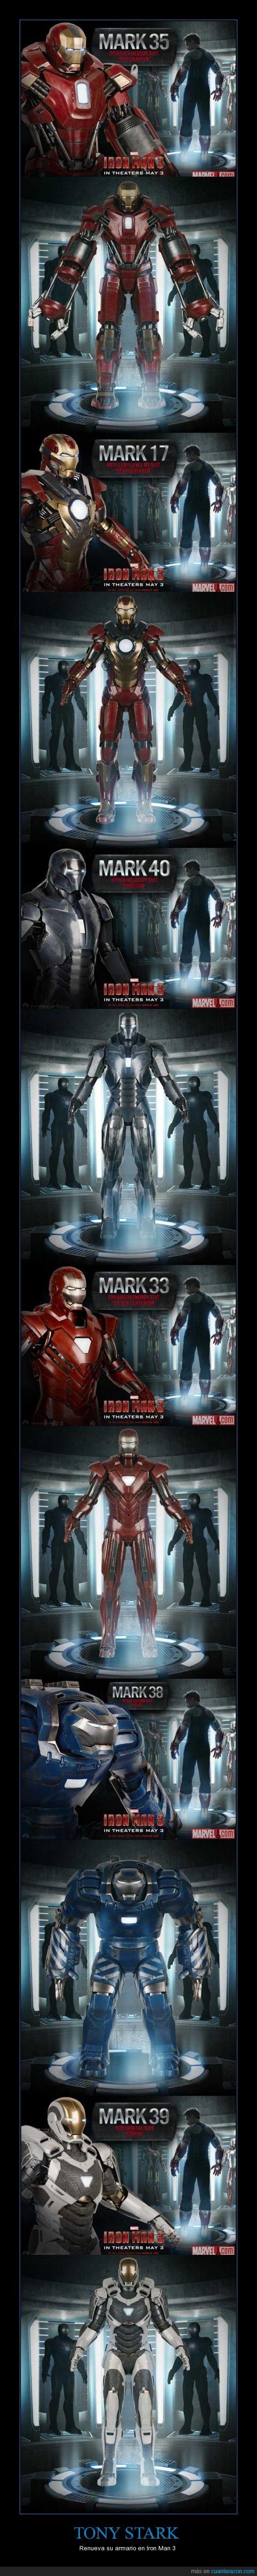 armadura,ironman,nueva